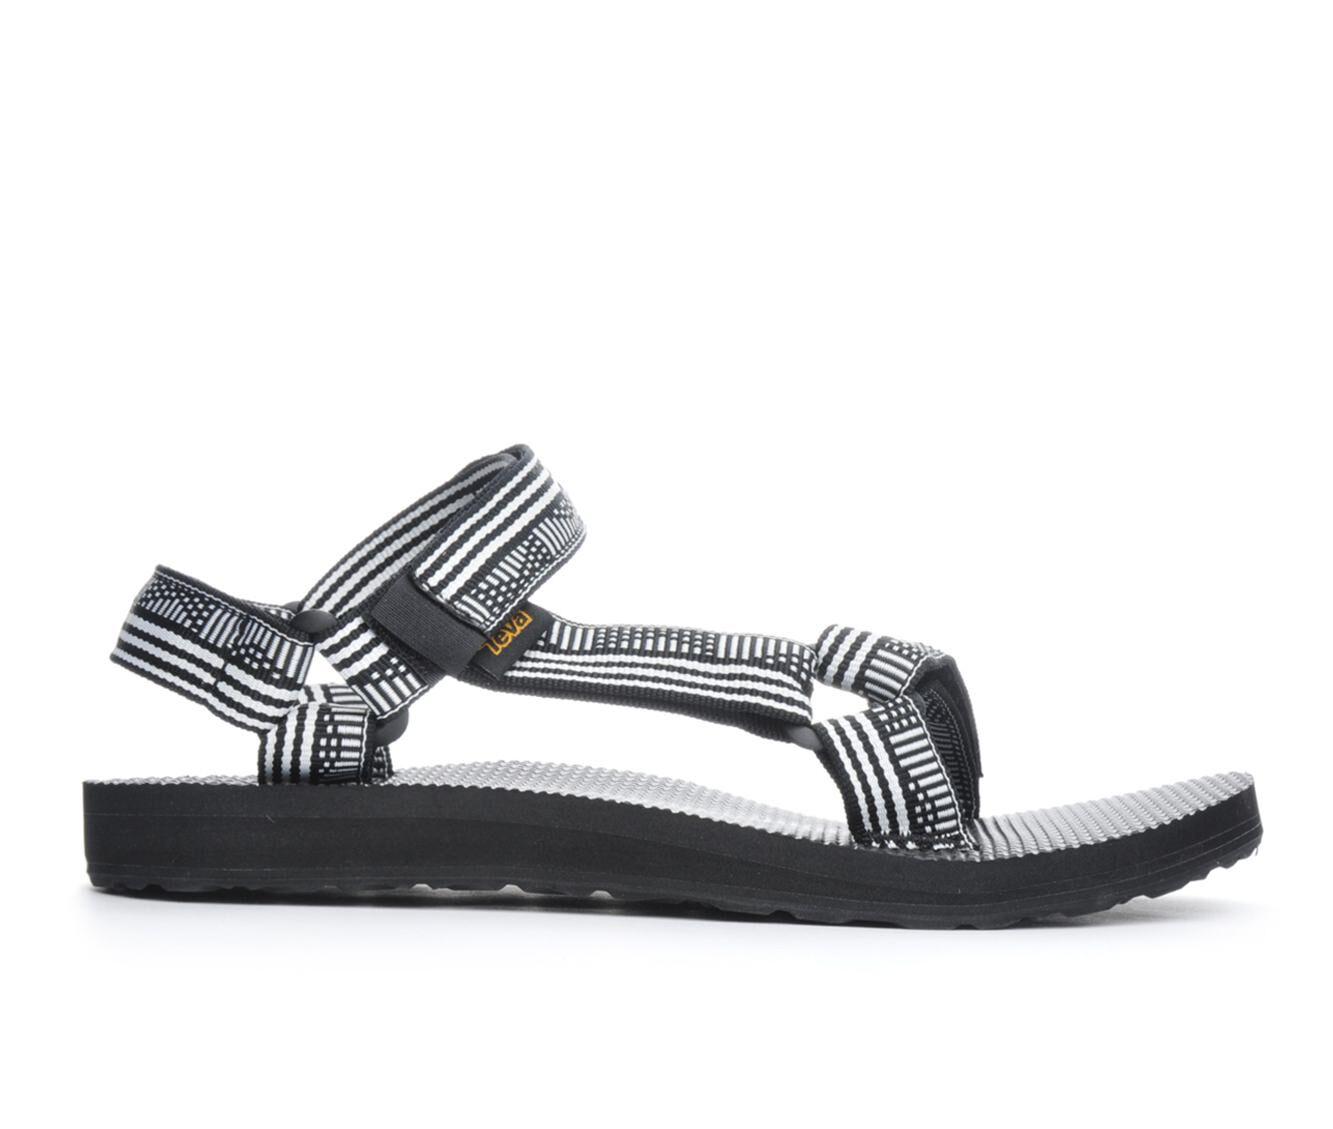 Women's Teva Original Universal Hiking Sandals Black/White